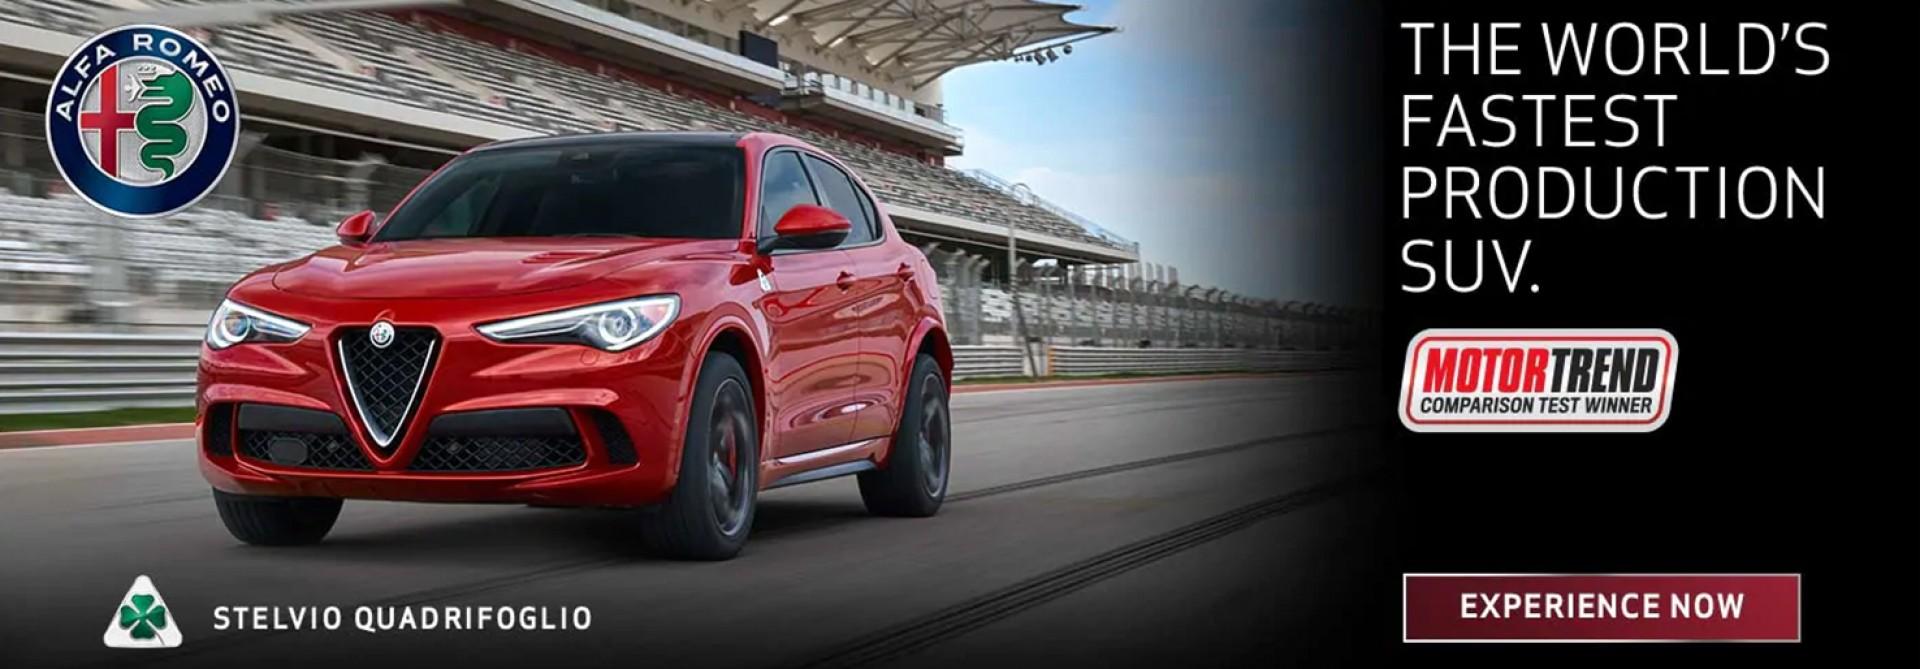 Stelvio Quadrifoglio - The World's Fastest Production SUV